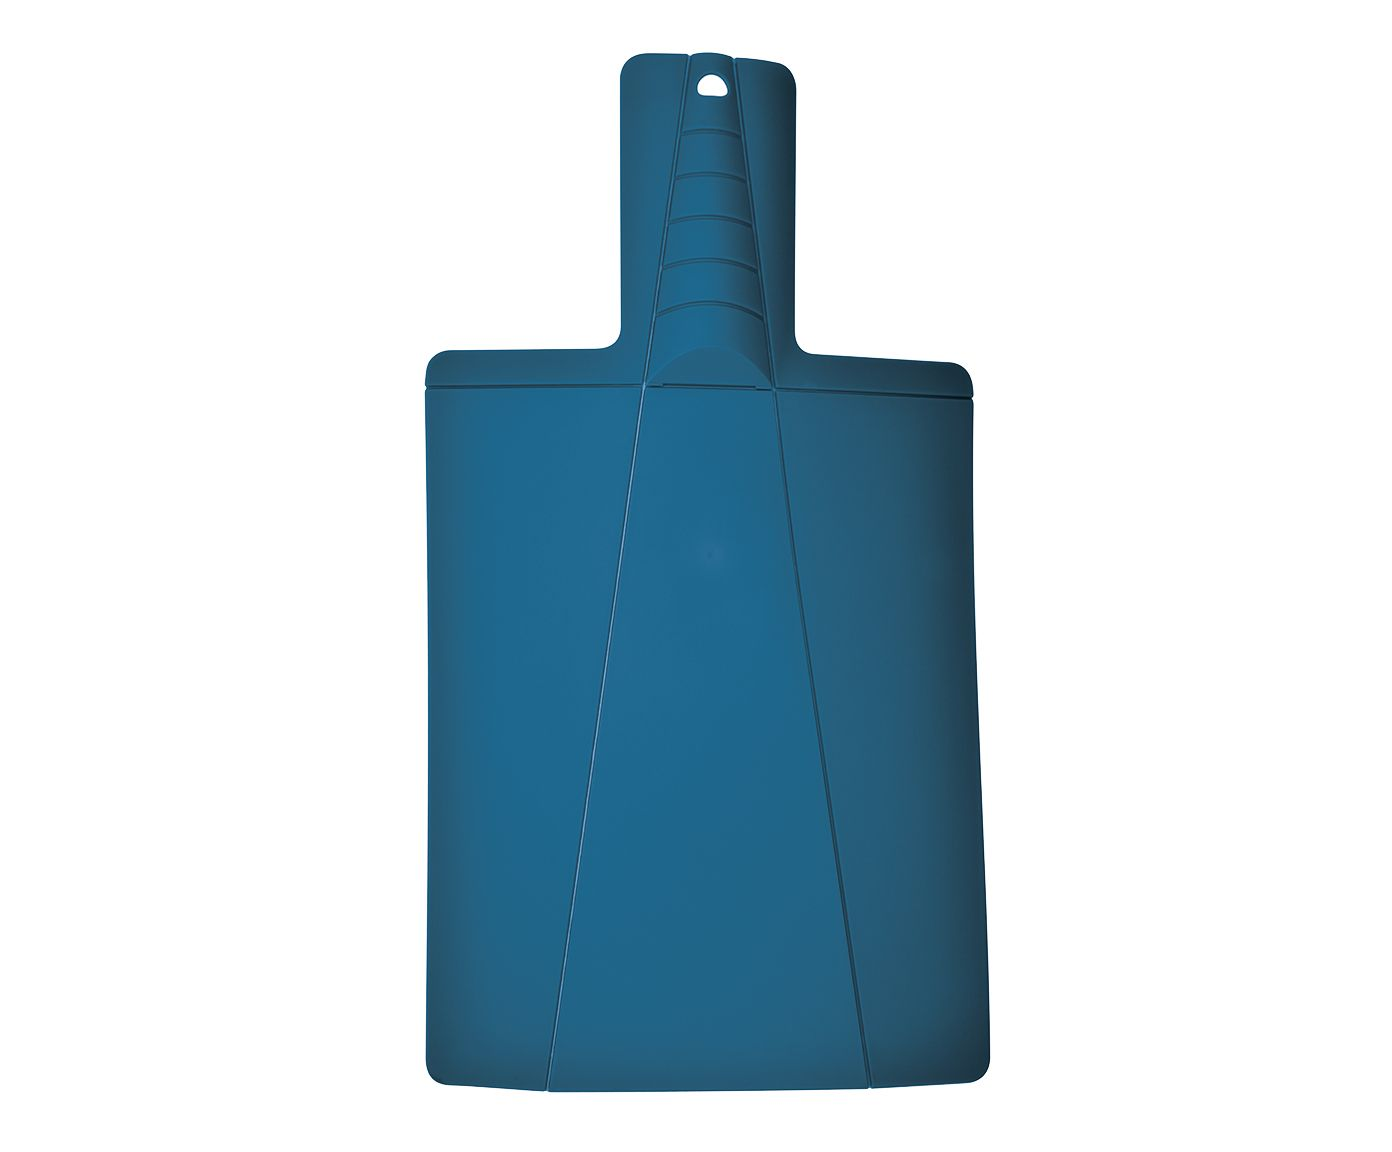 Tábua Dobrável para Alimentos Elemental - 38X21,5cm | Westwing.com.br